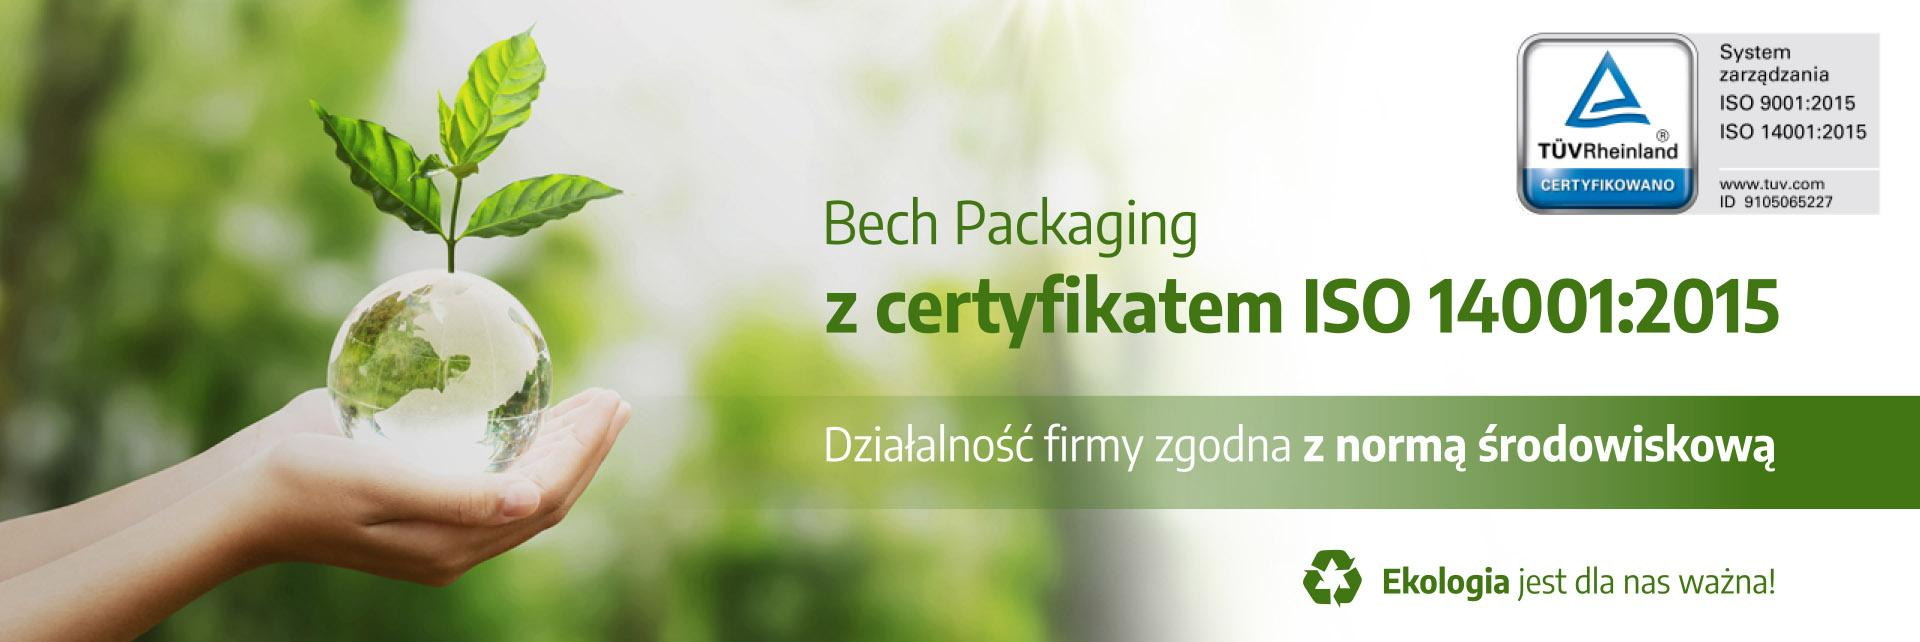 Certyfikacja ISO – slider2a.cdr